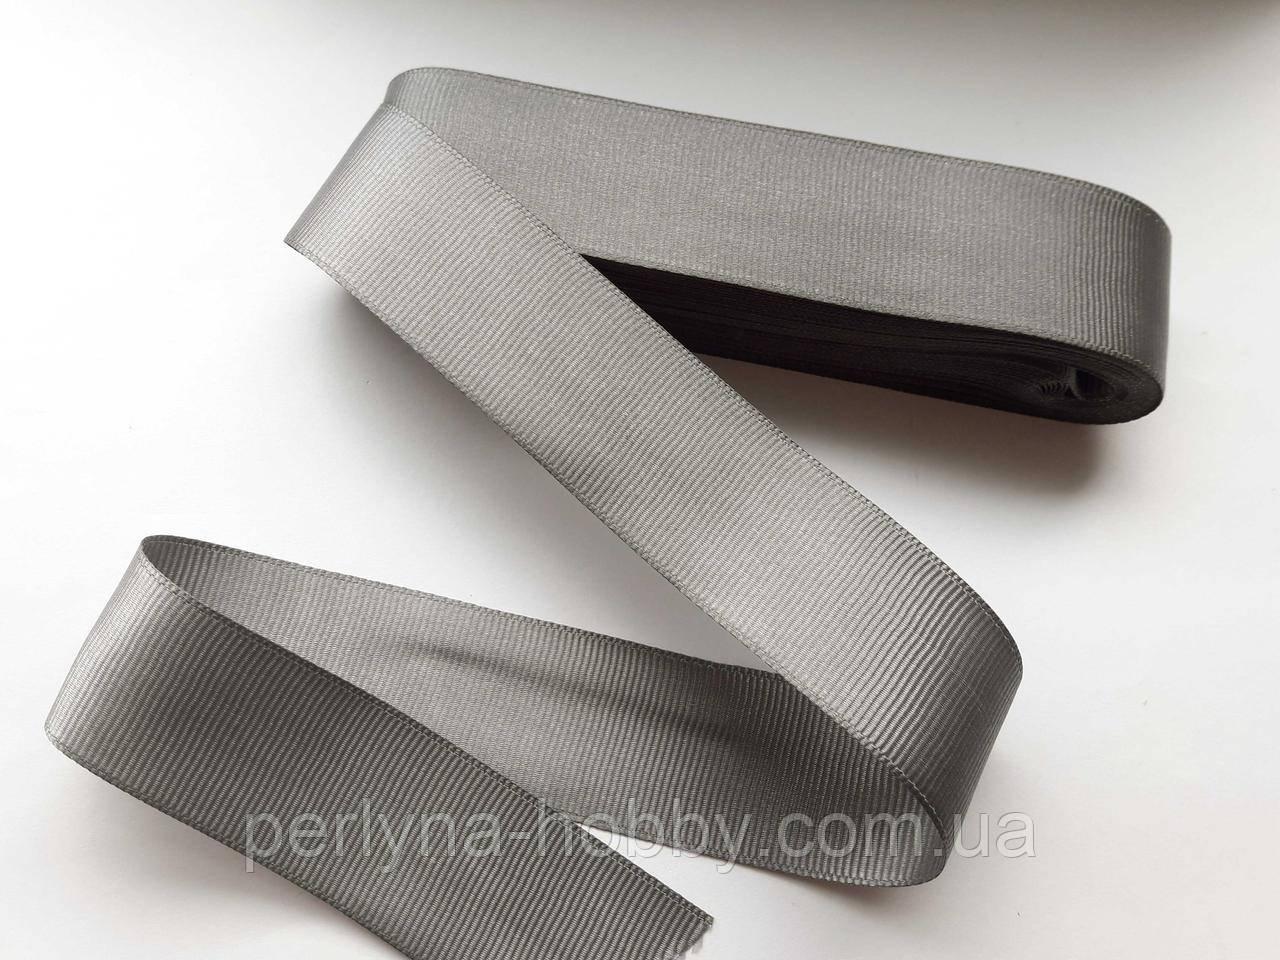 Тесьма лента репсовая широкая Стрічка репсова  4 см 40 мм. Сіра 45. Туреччина